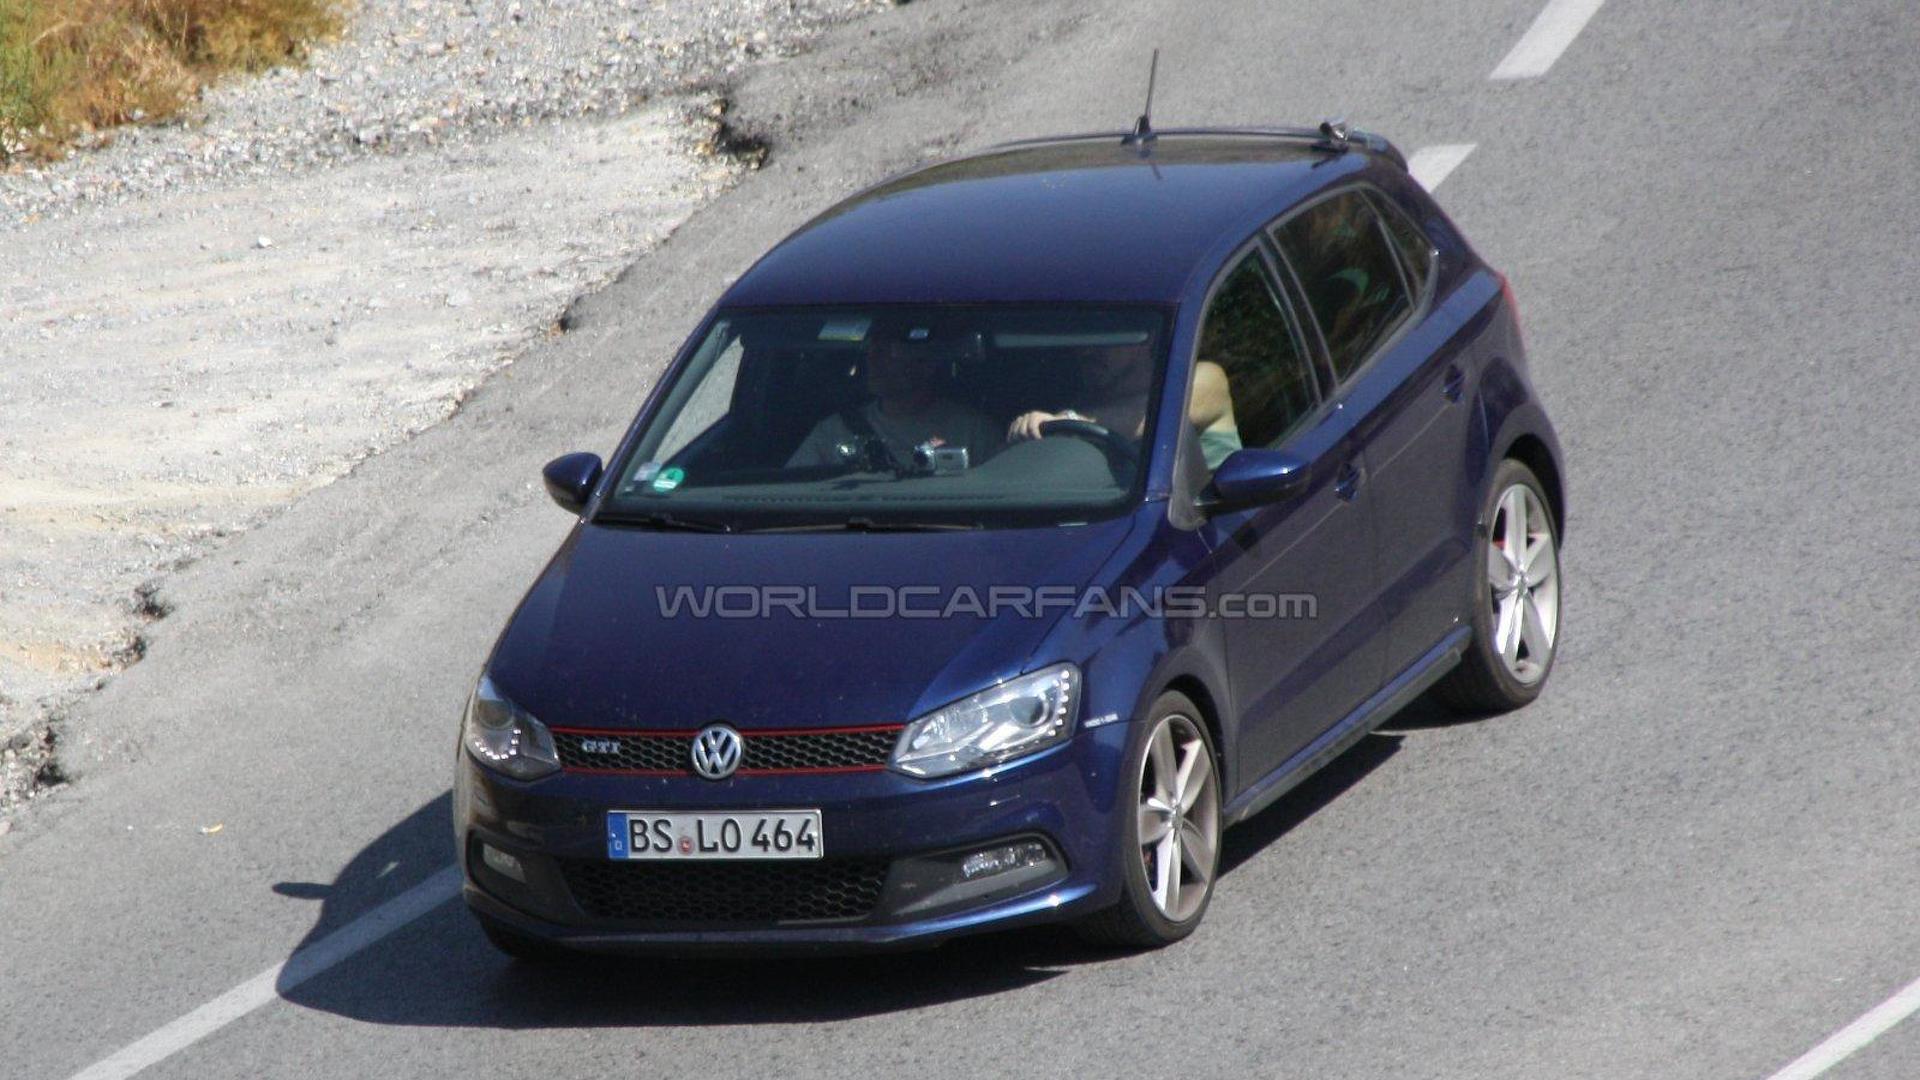 Volkswagen Polo R first spy photos